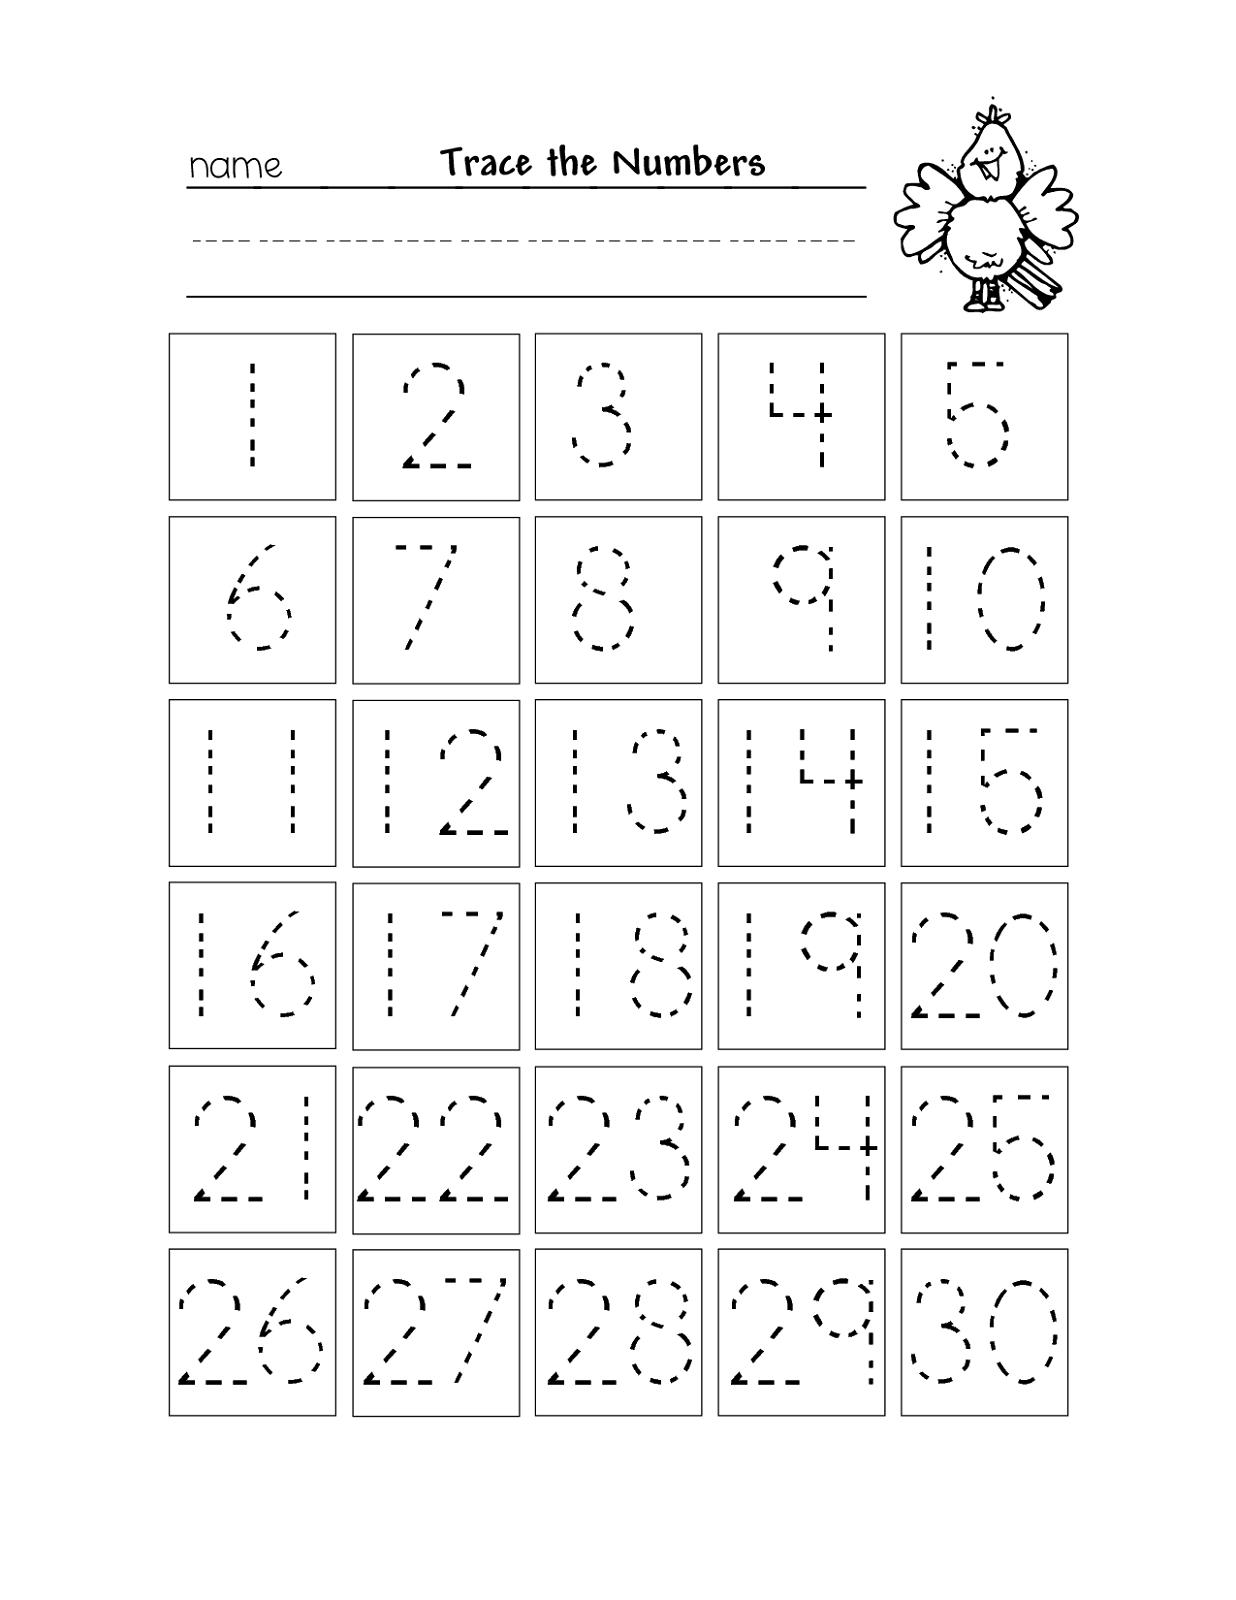 Free Printable Number Chart 1-30 | Kinder | Kindergarten Worksheets | Free Printable Number Worksheets